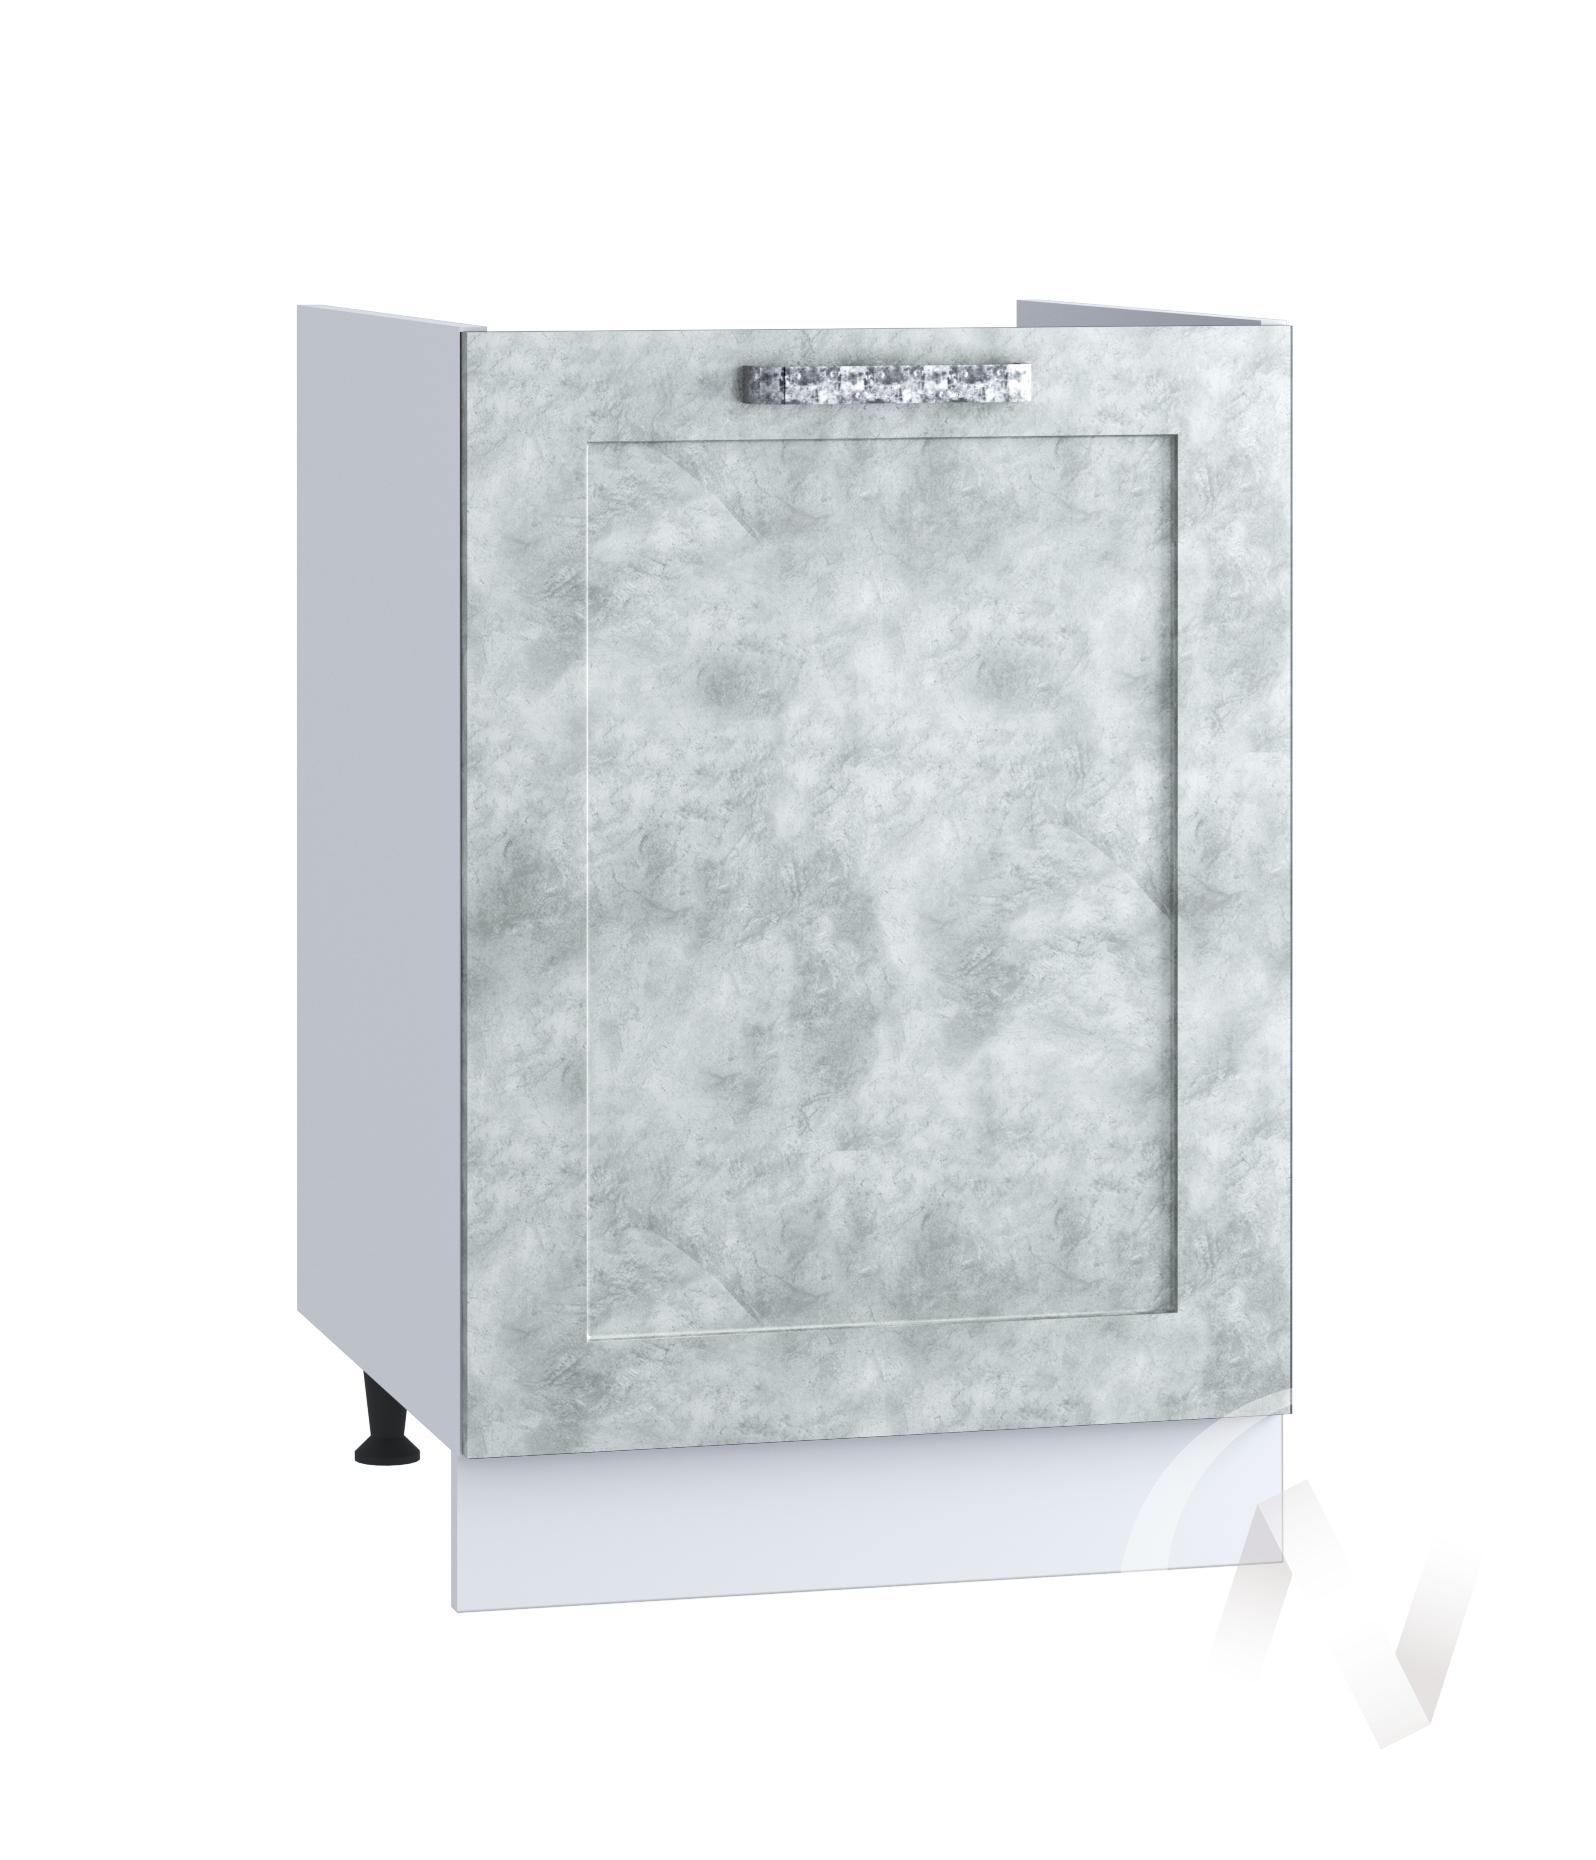 "Кухня ""Лофт"": Шкаф нижний под мойку 500, ШНМ 500 (Бетон серый/корпус белый)"